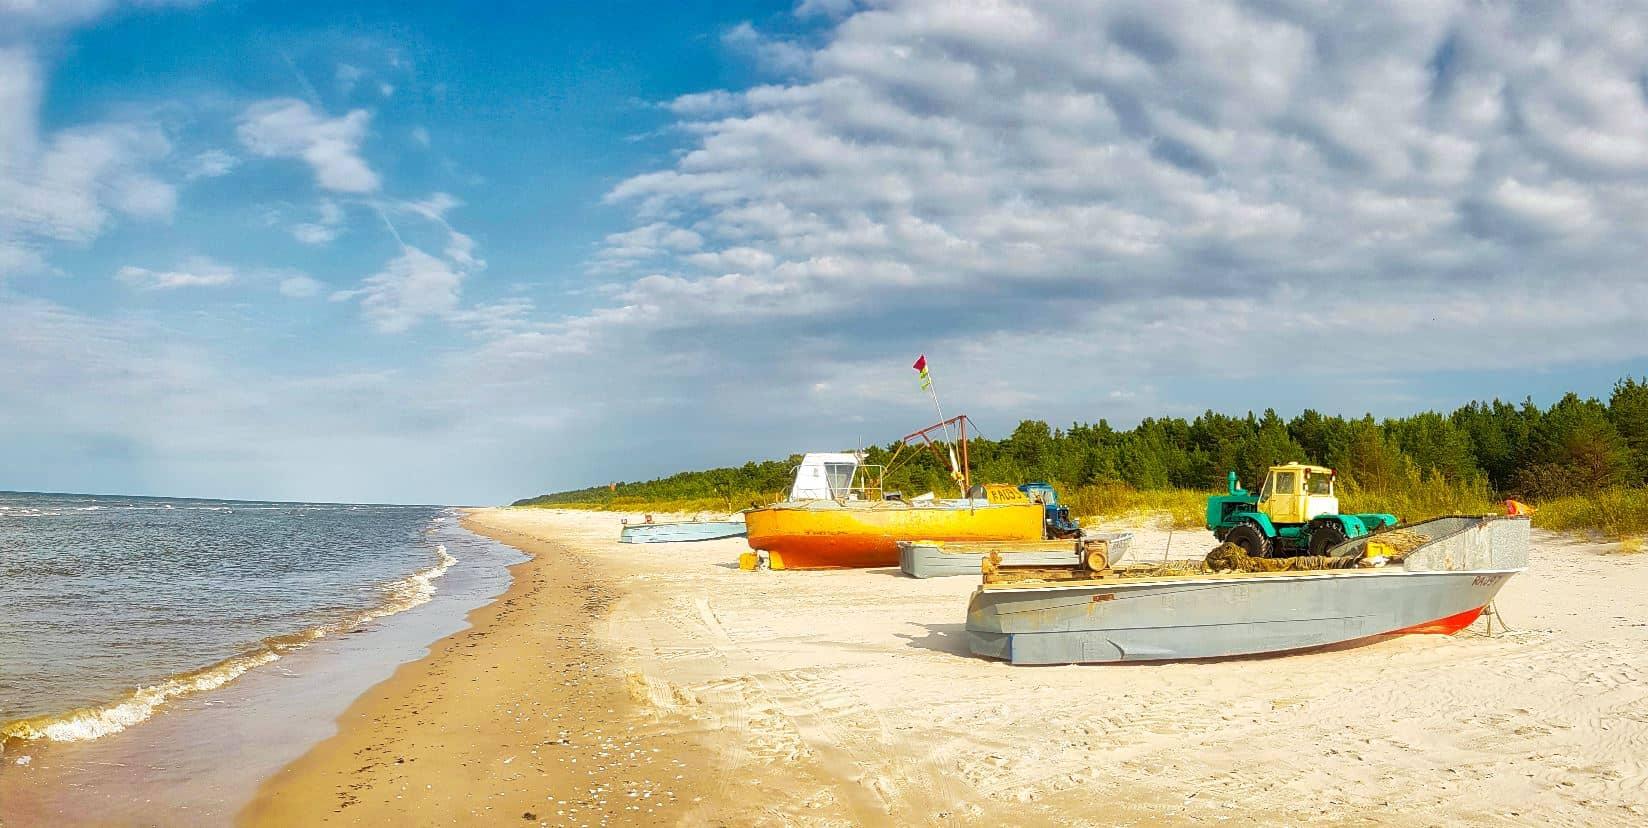 Remote fishermen village in the Western coast of Latvia